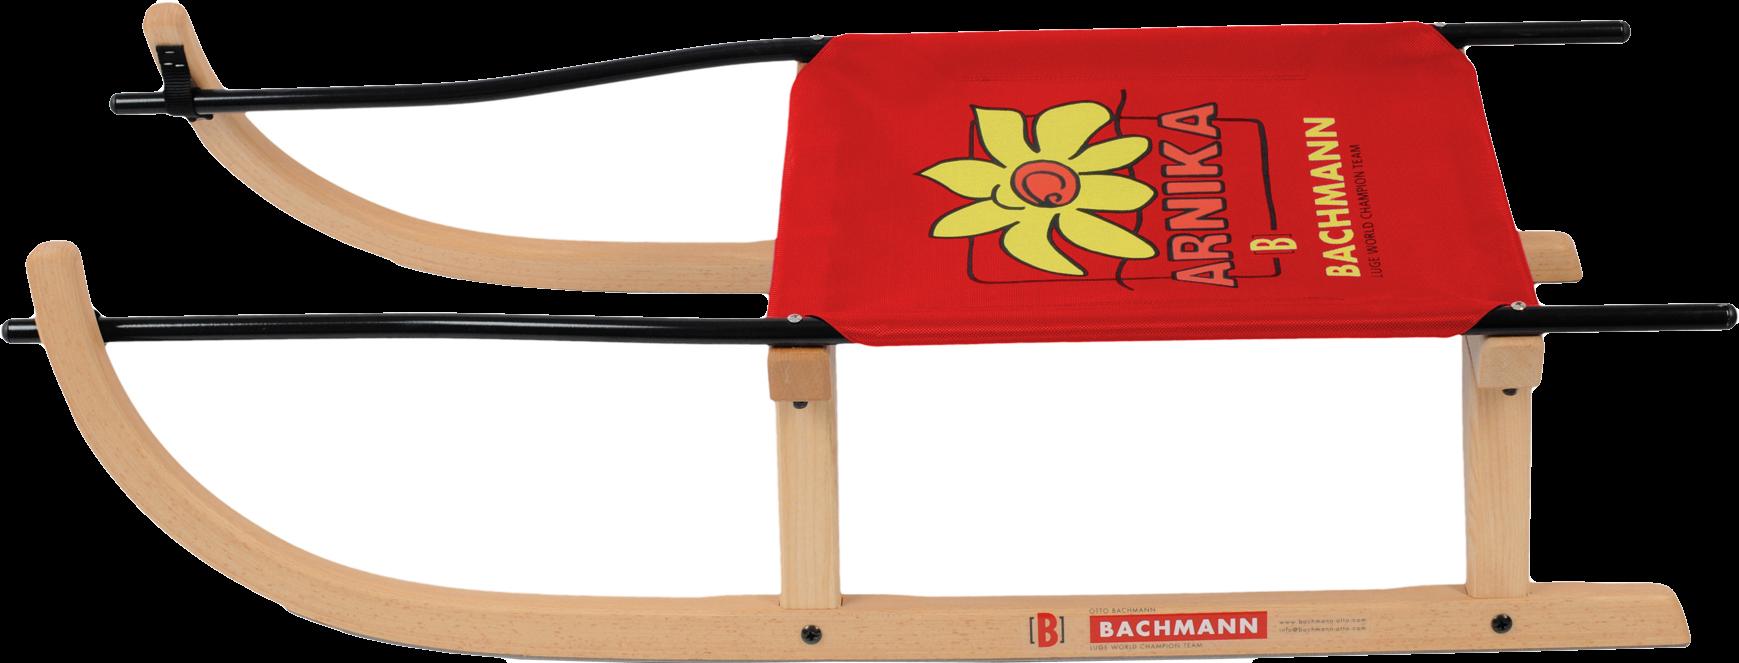 BACHMANN 100 Arnika Holz 96 cm - Rodel